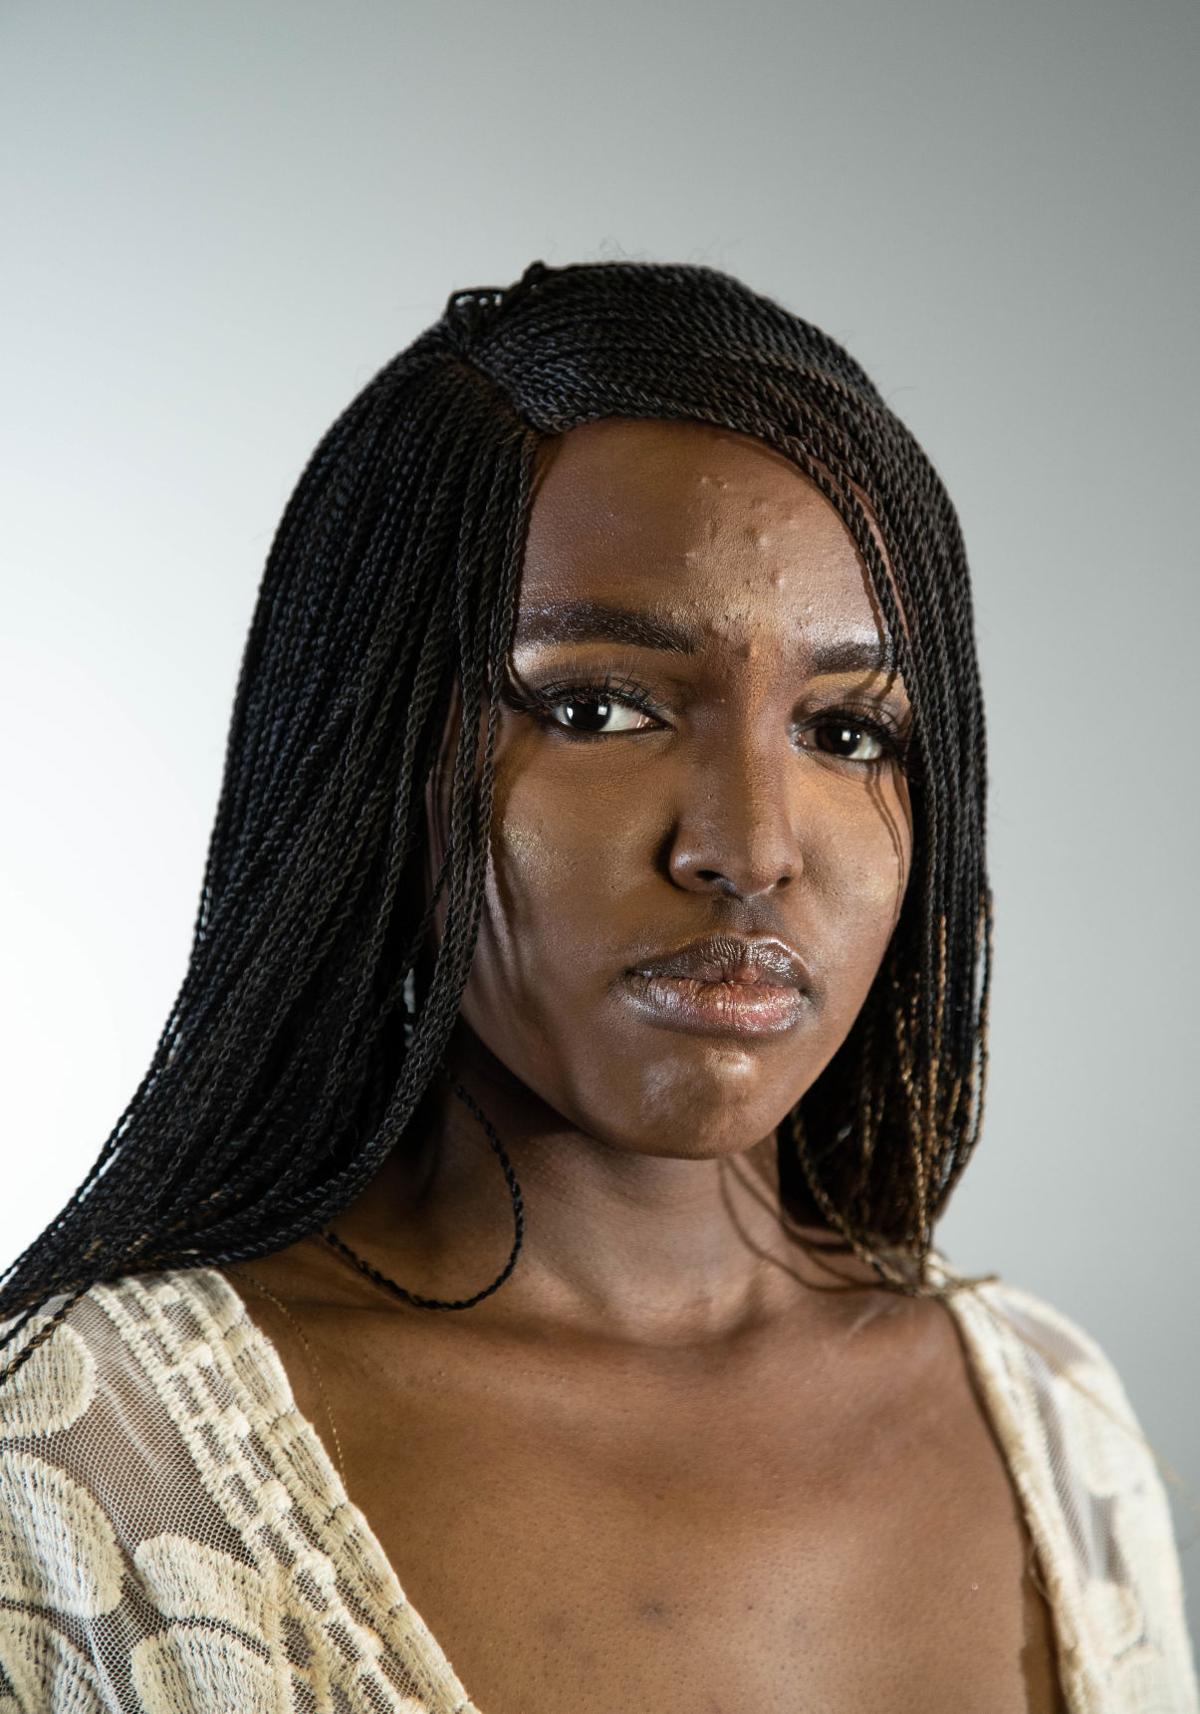 Opinion: Black community at UTA needs better representation in academia